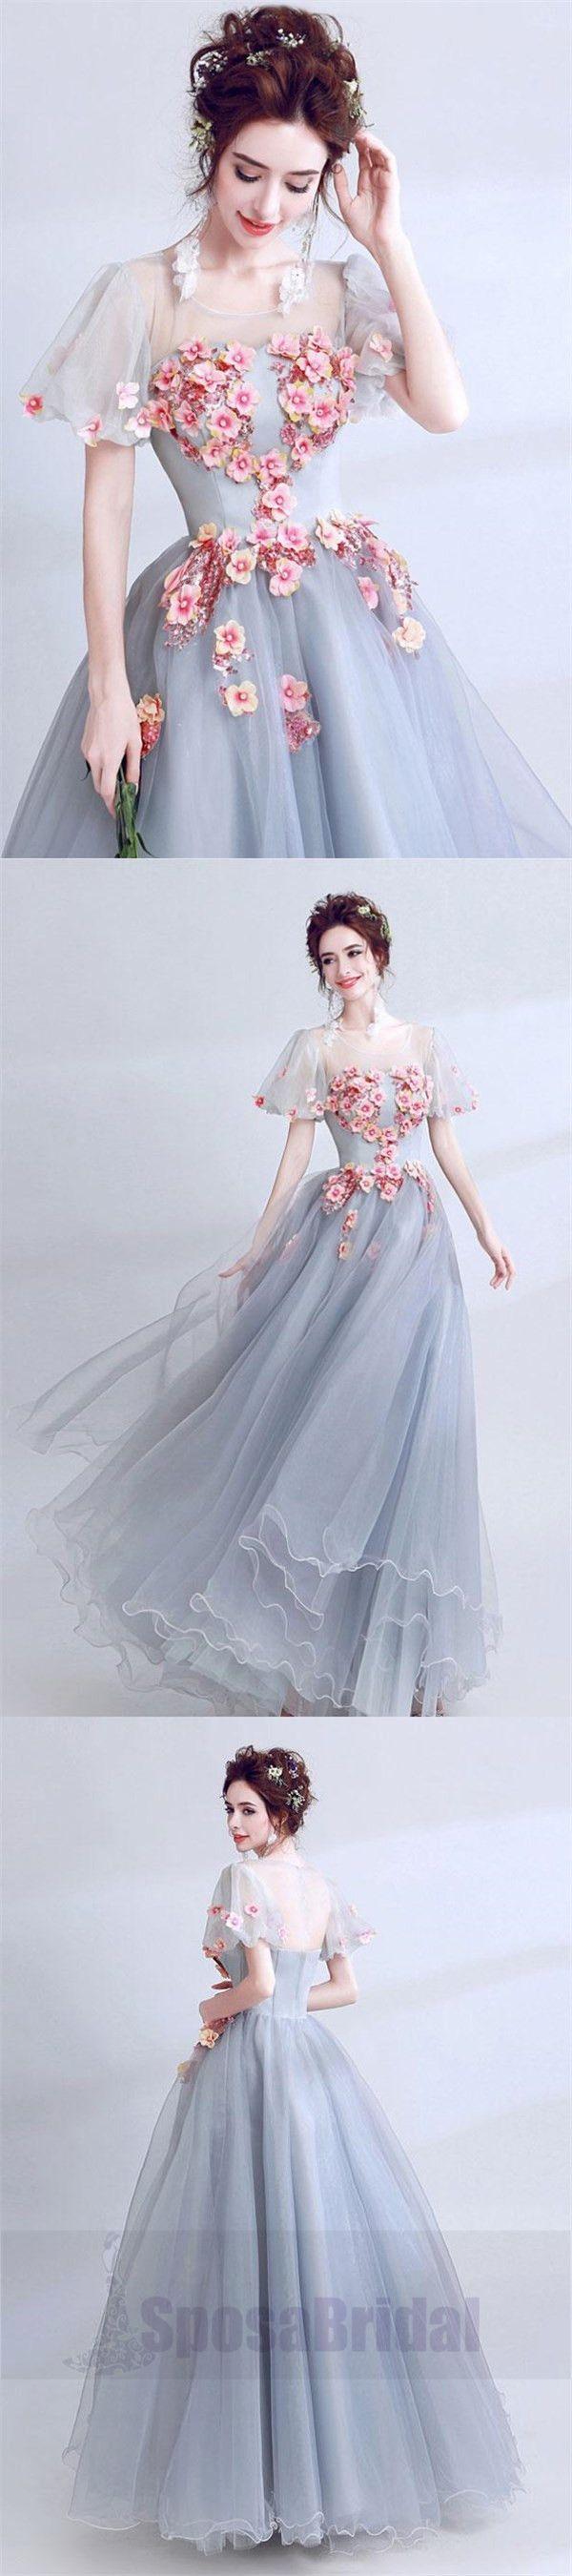 Custom Short Sleeves Pretty Gorgeous Formal High Quality Prom Dresses, Evening Dresses, PD0469  #promdress#fashion sposabridal#